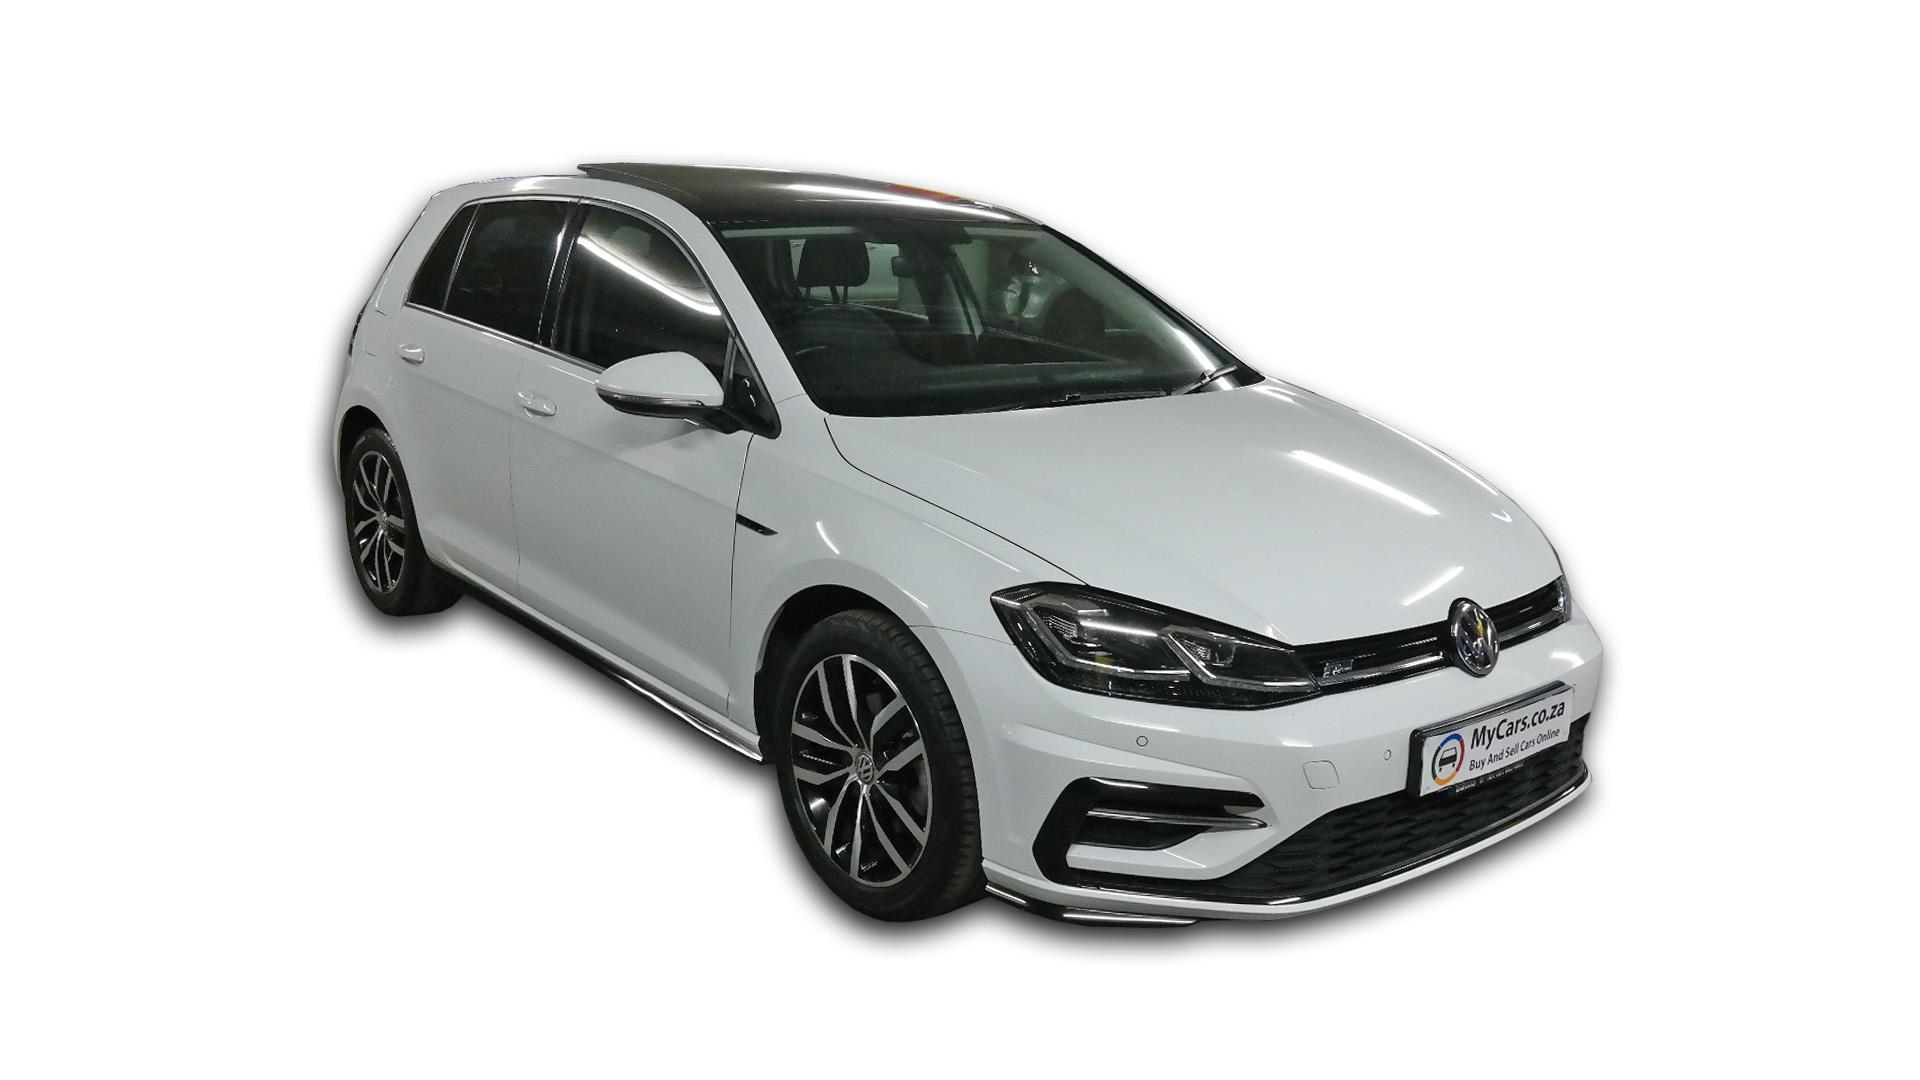 Volkswagen Golf Vii 1.4 Tsi CO